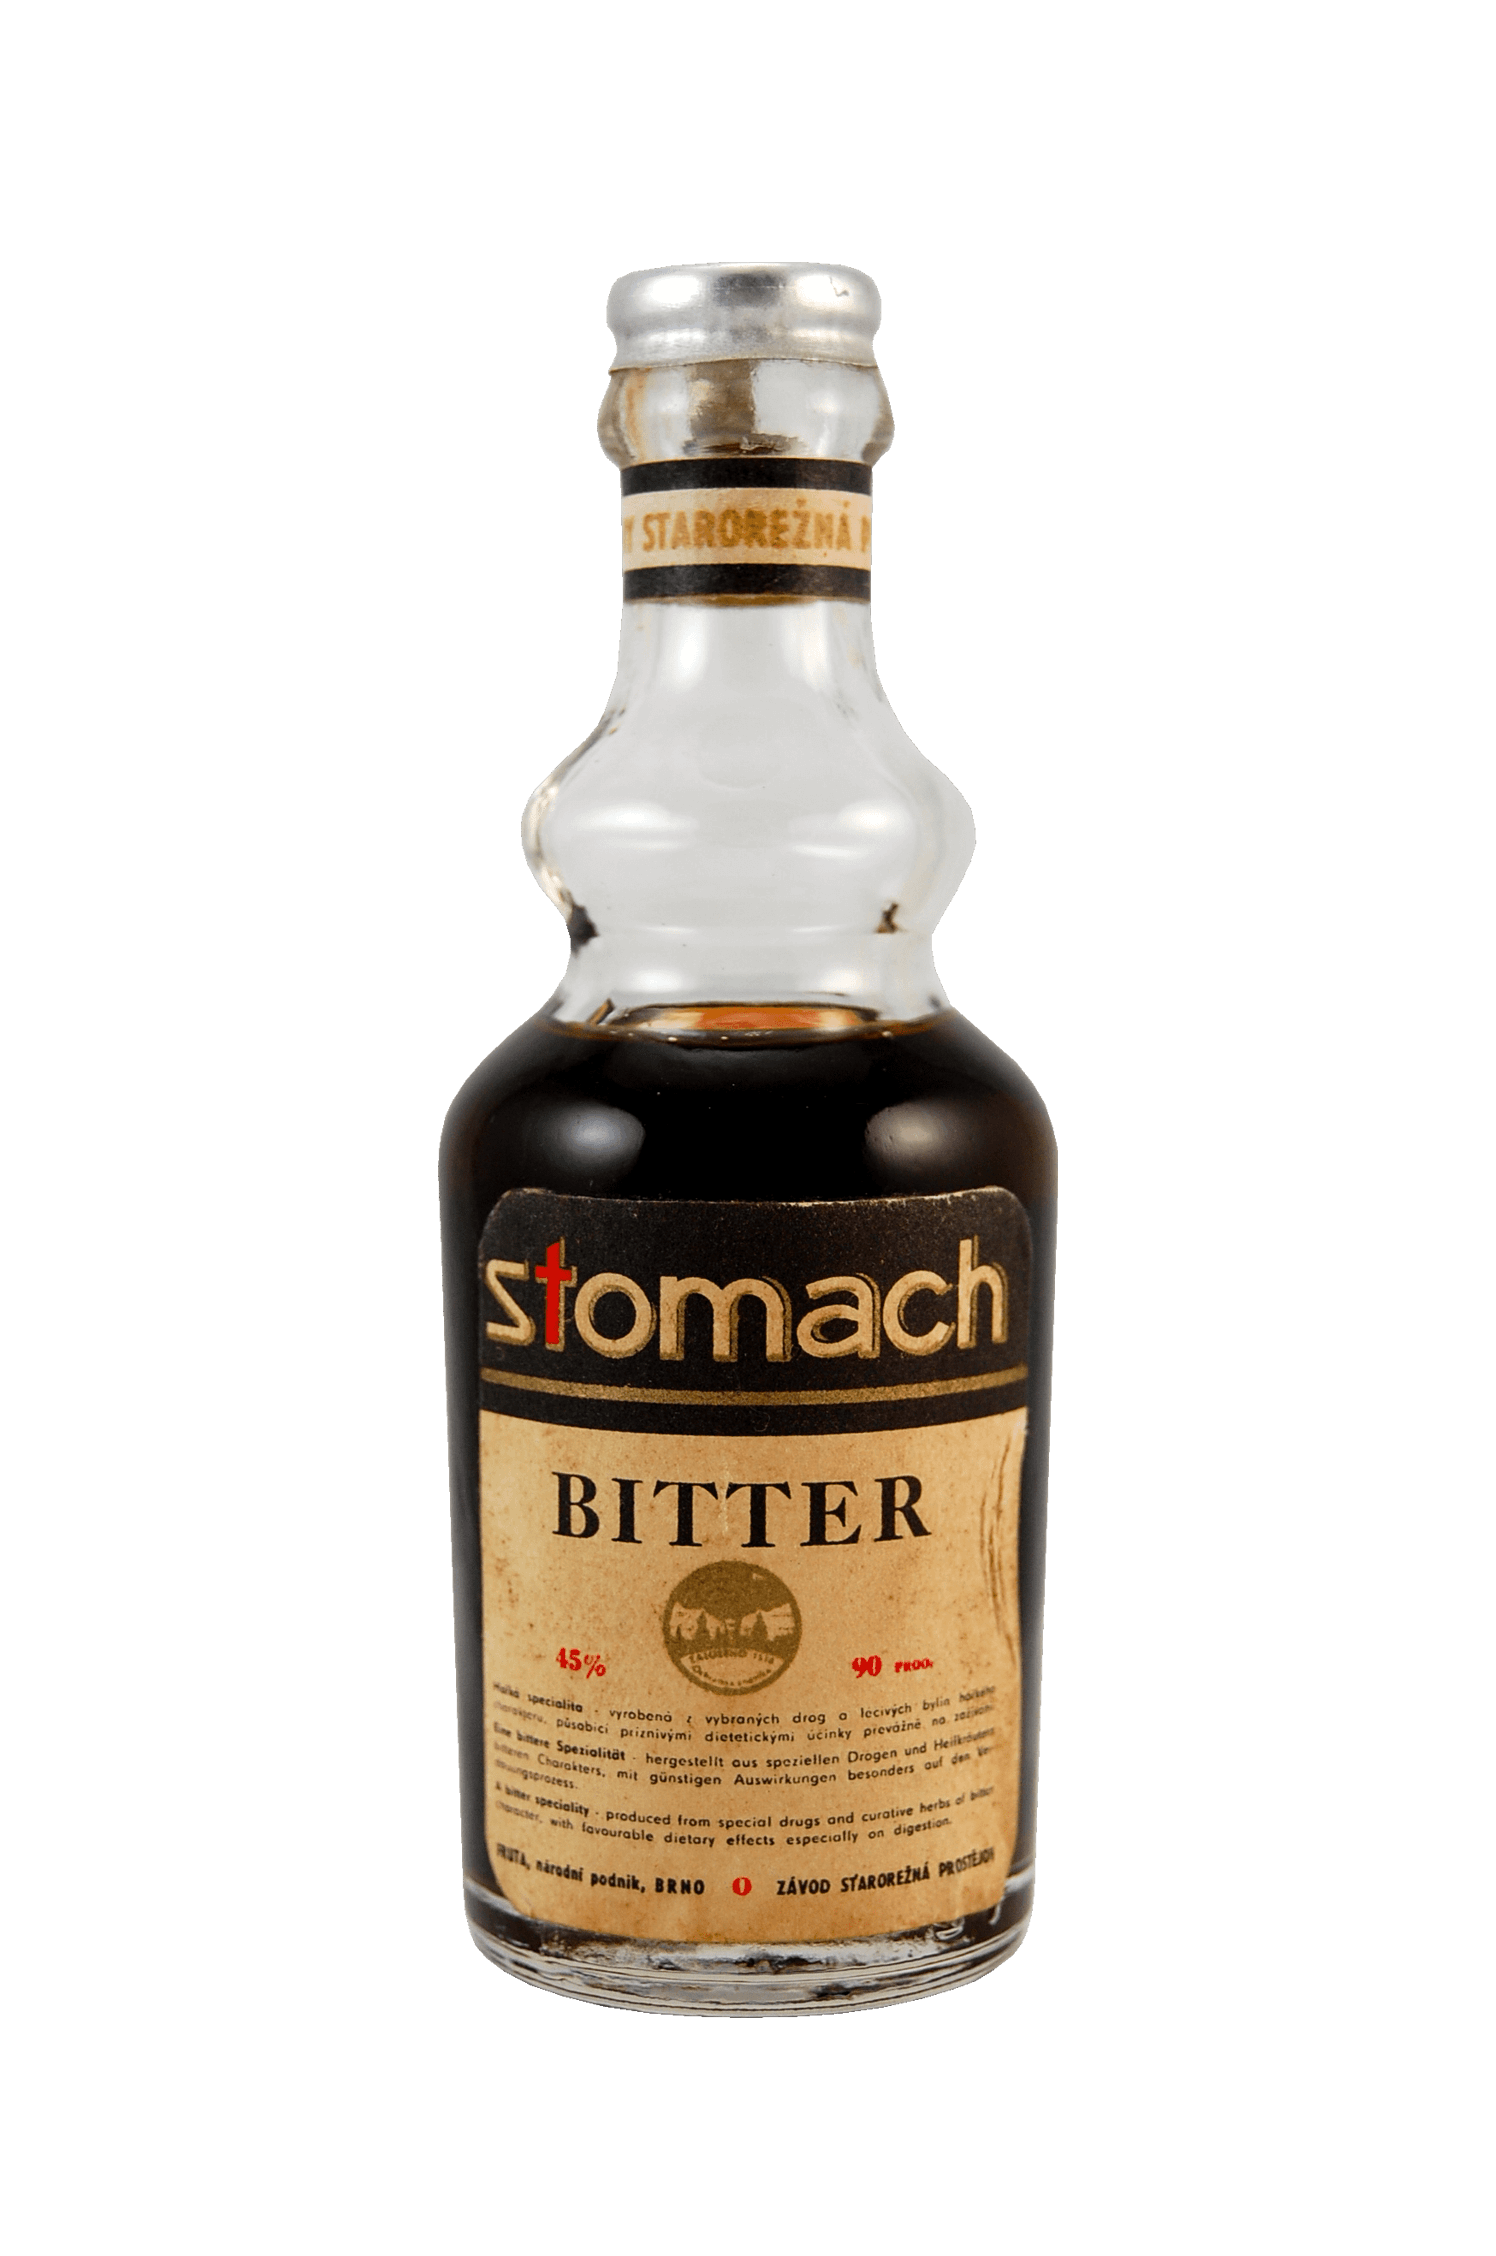 Stomach Bitter